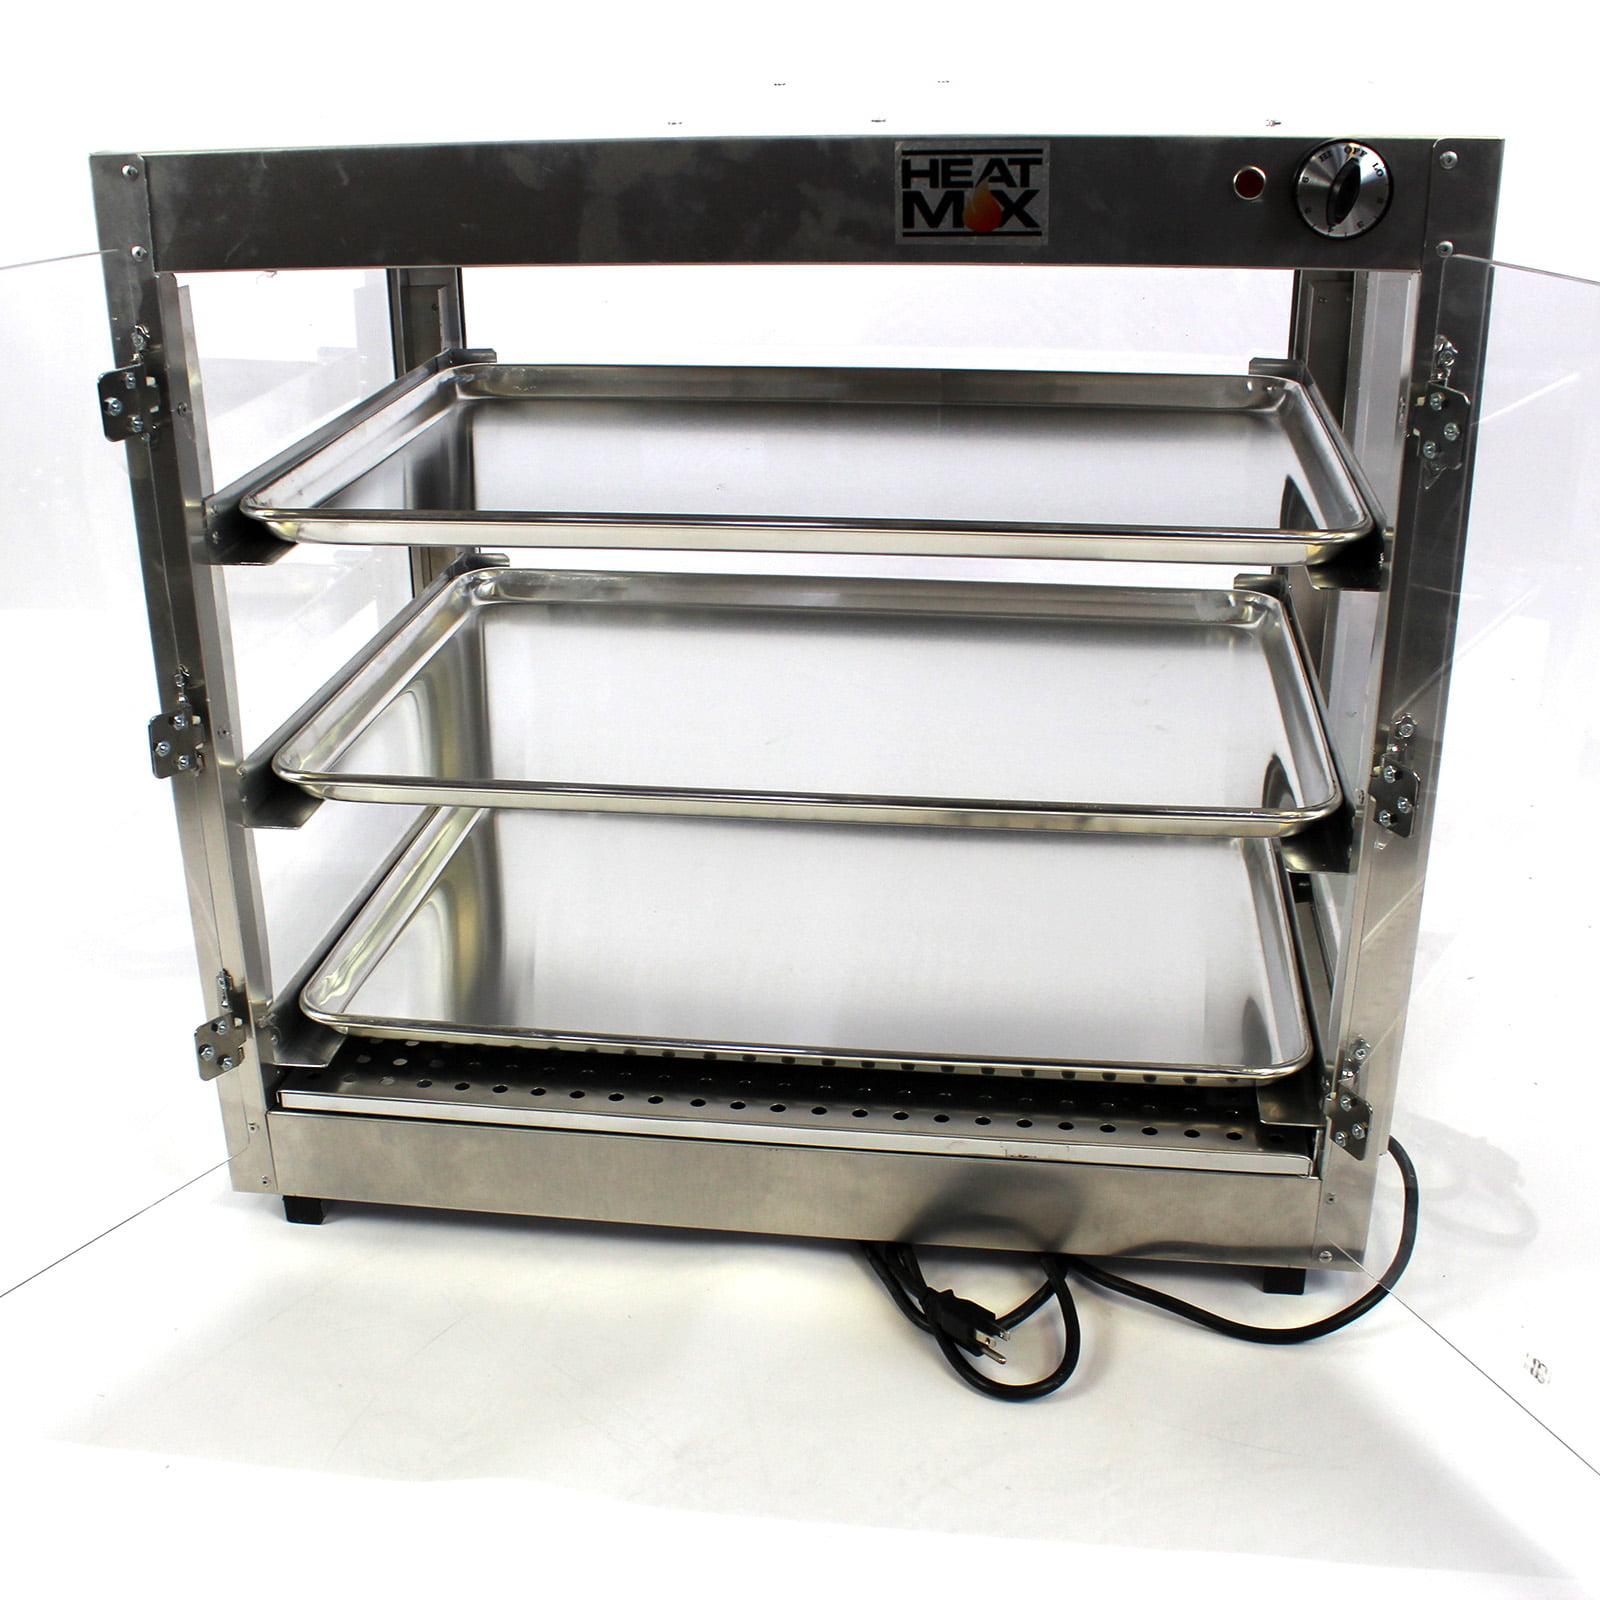 HeatMax Commercial 29x20x27 Food Warmer Display Case Temp ...